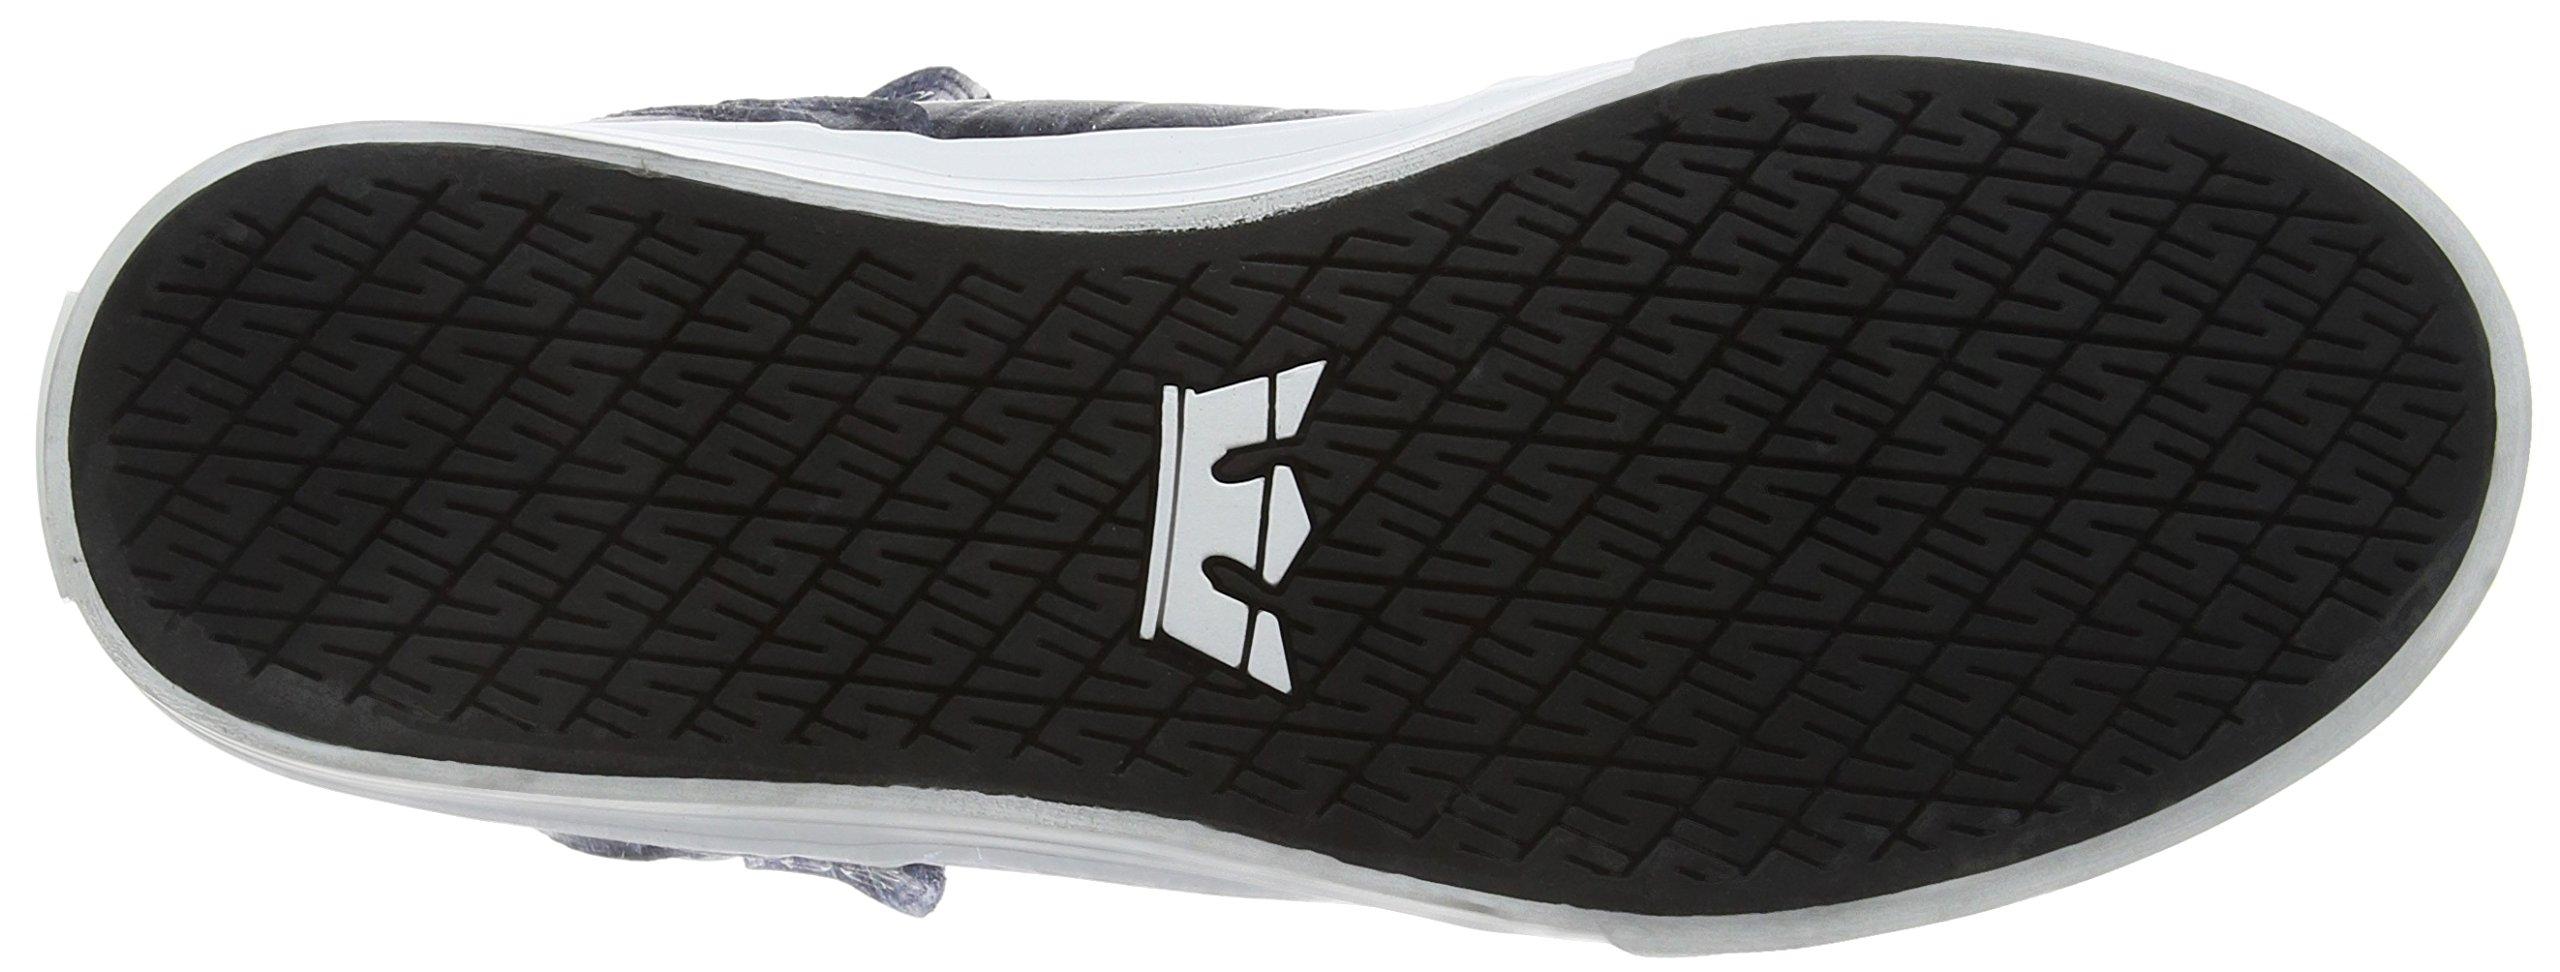 Supra Skytop Skate Shoe, Black/White, 5.5 Regular US by Supra (Image #3)